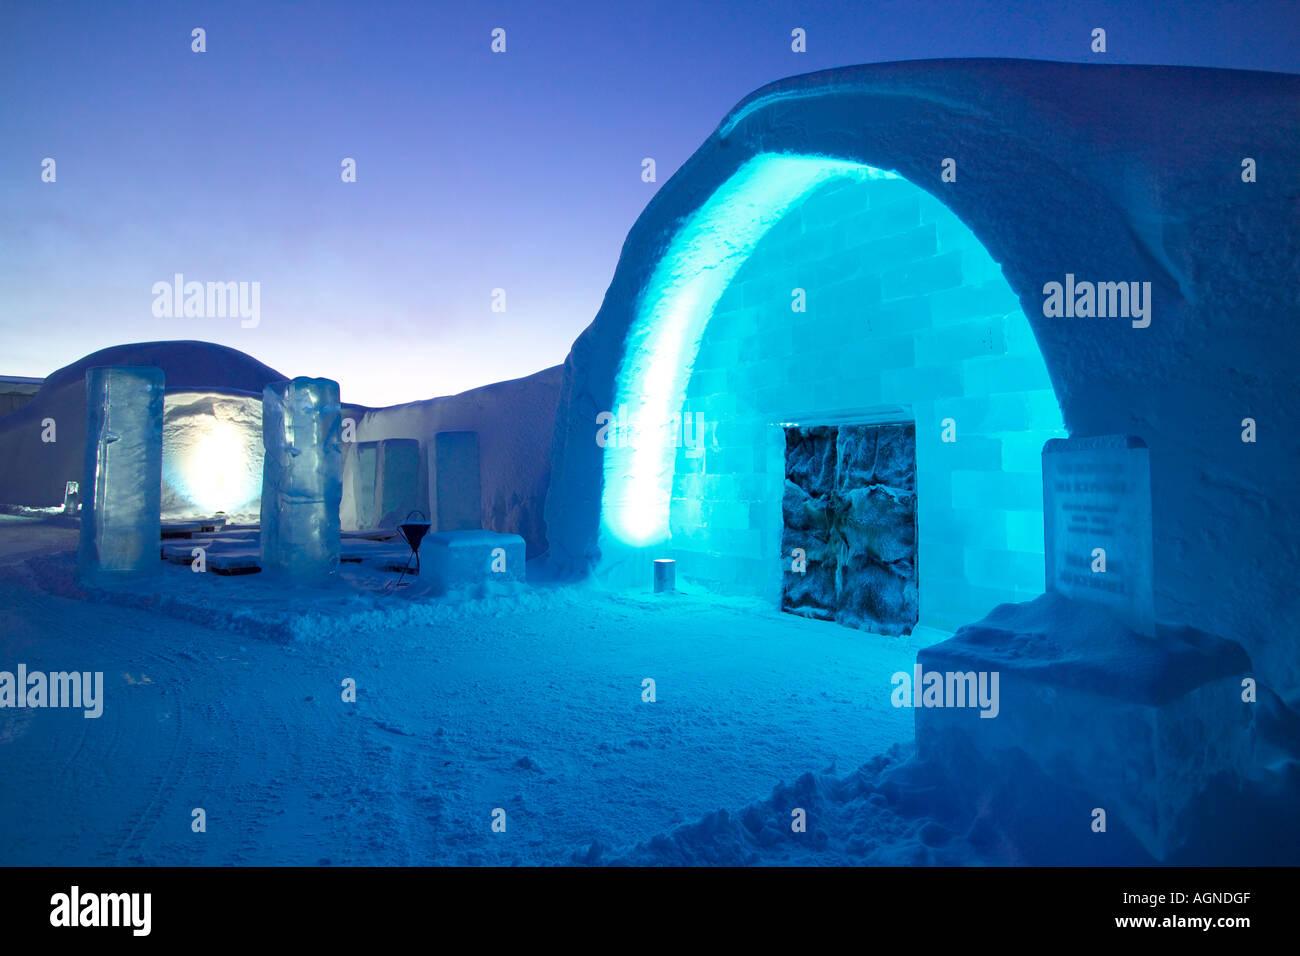 Main entrance of the Ice hotel Jukkasjarvi Sweden - Stock Image